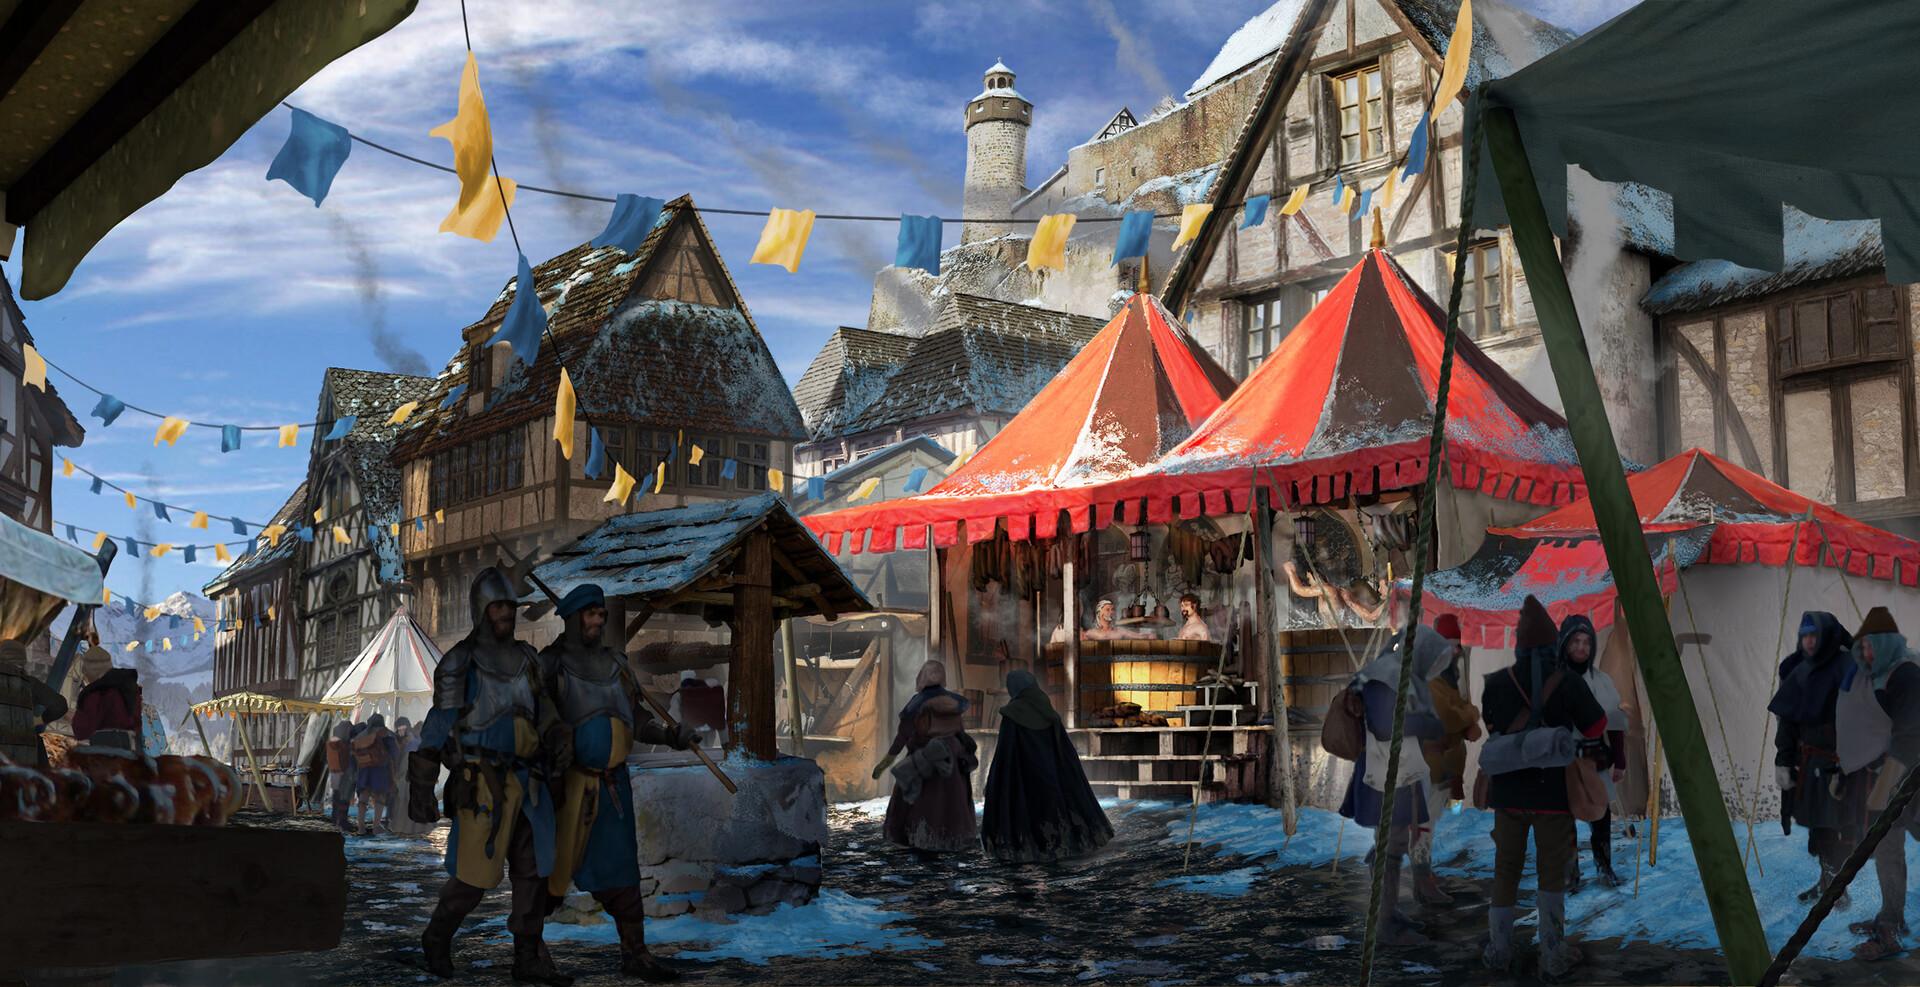 Francis goeltner medievalfantasy travelingbathhouse03 wip0x m